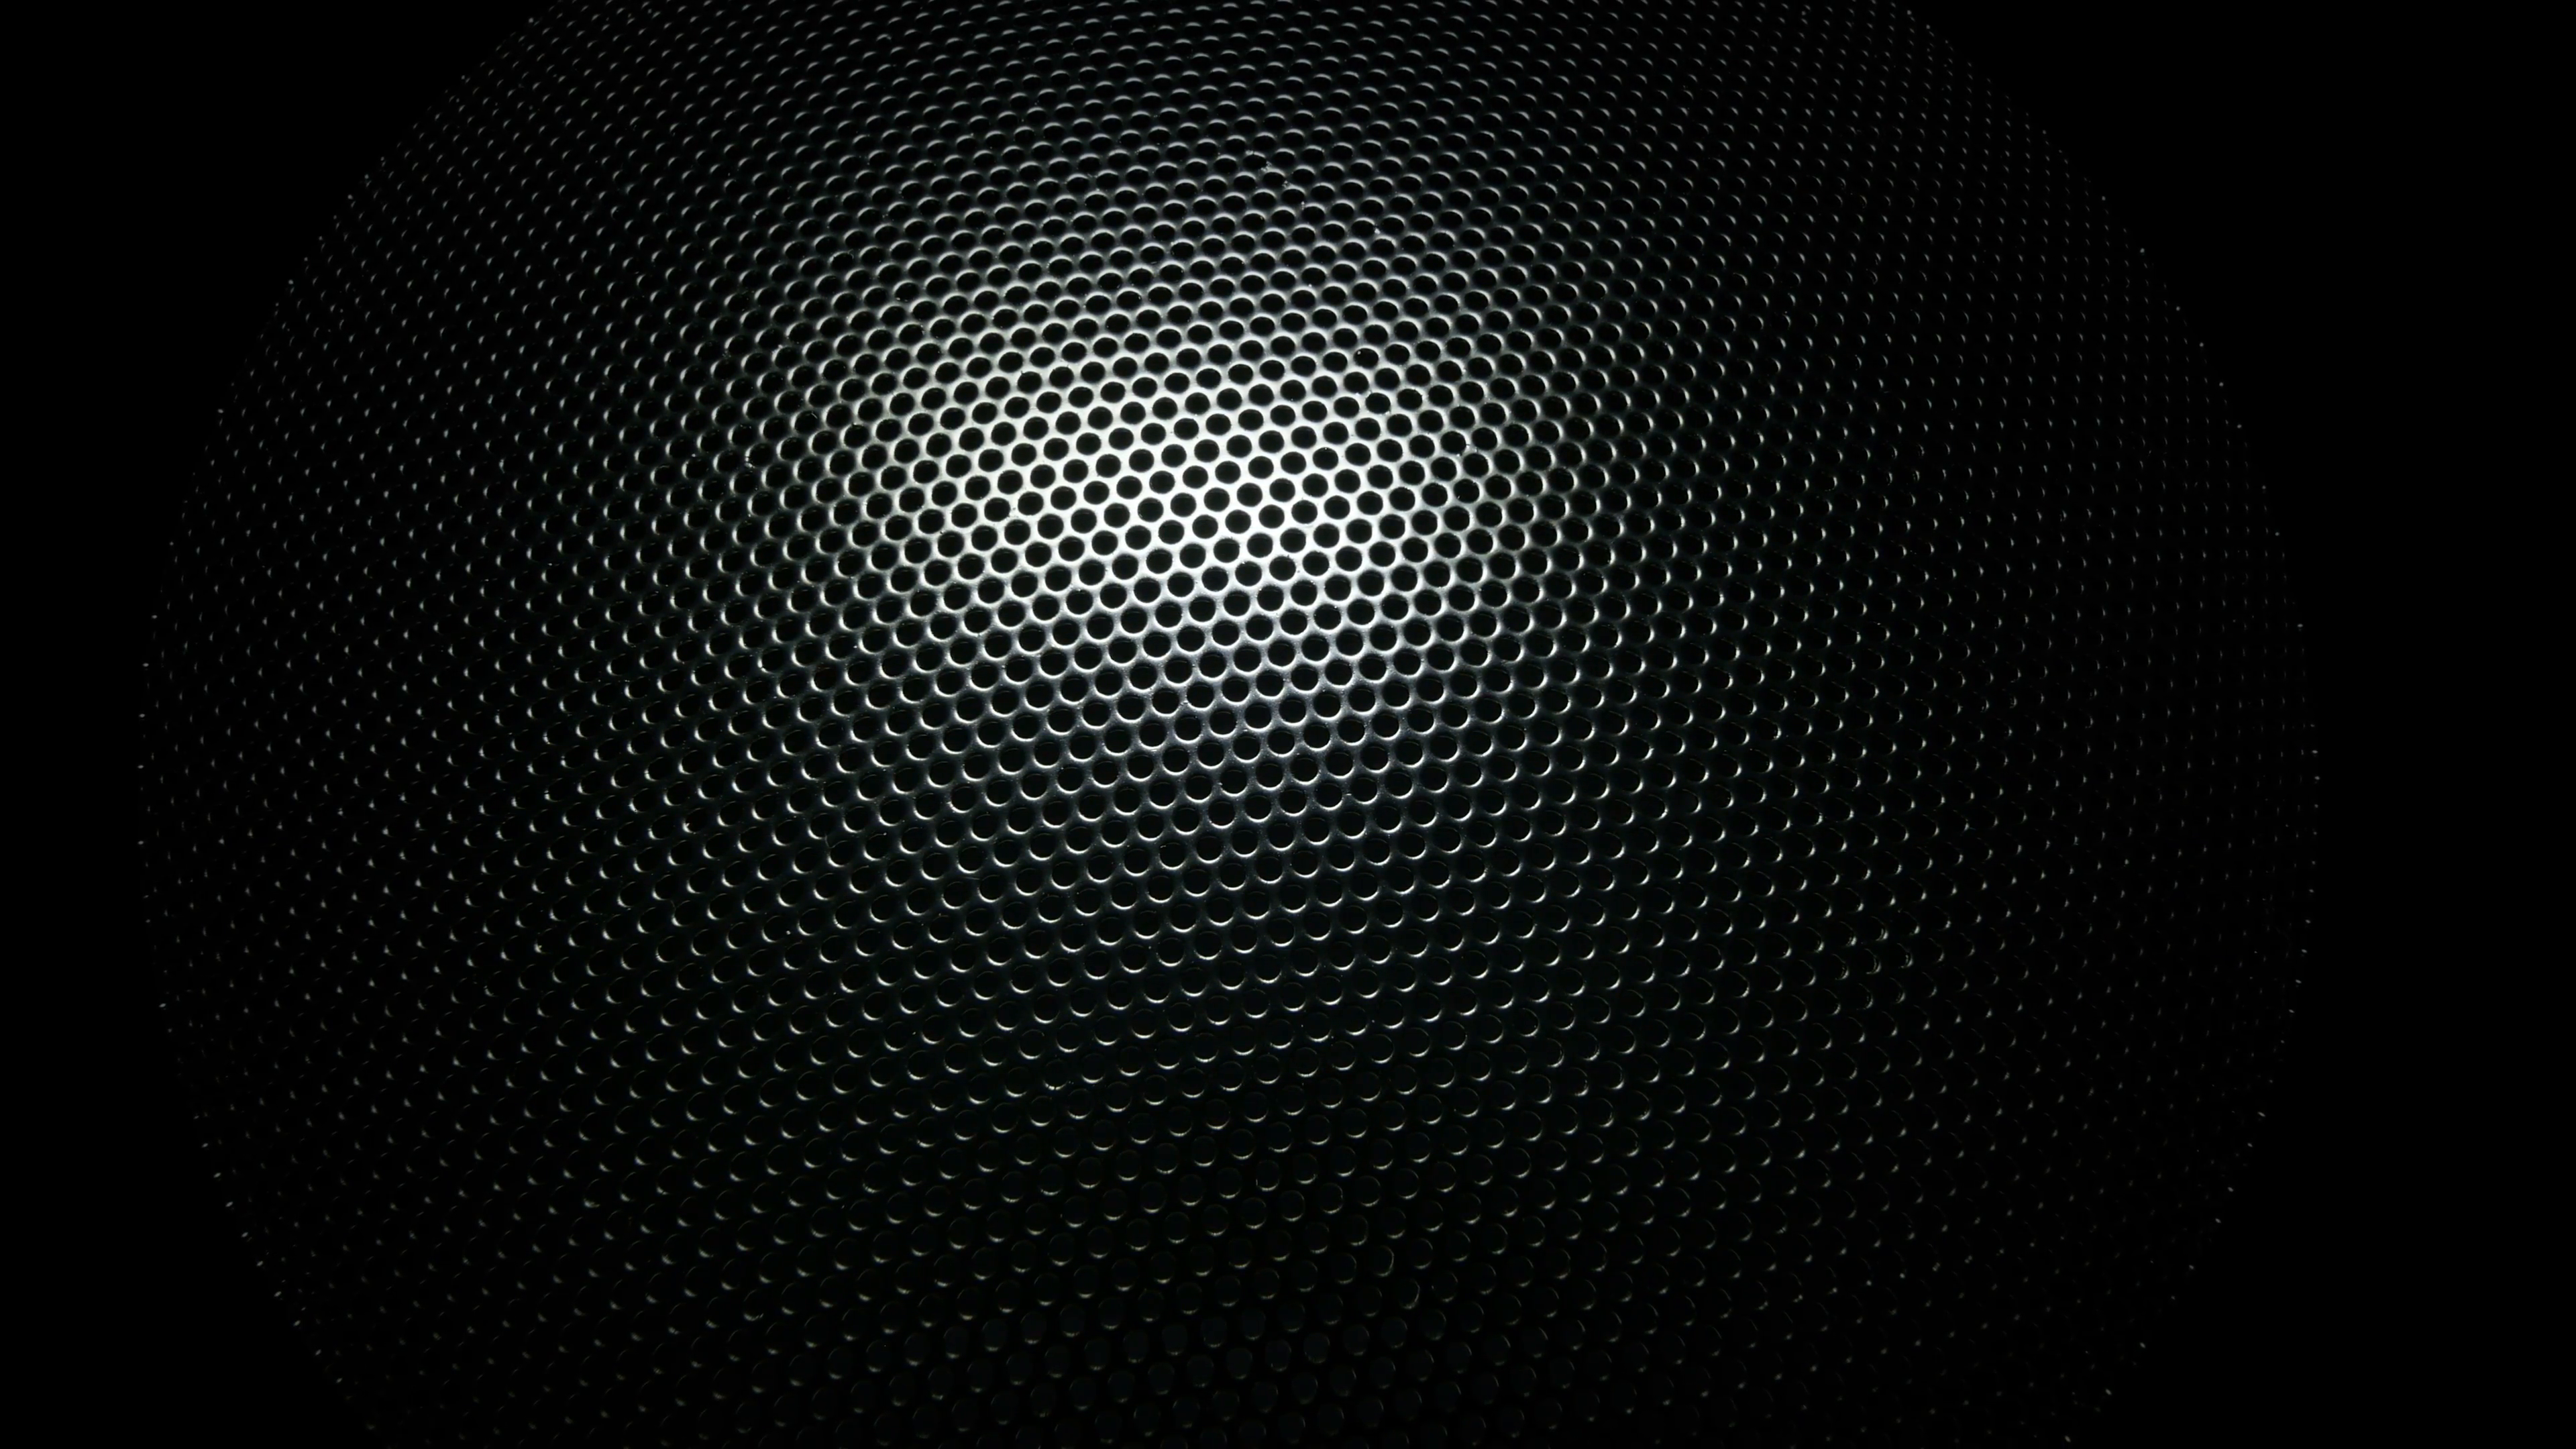 Metallic grid motion background. Dark metal background with ...